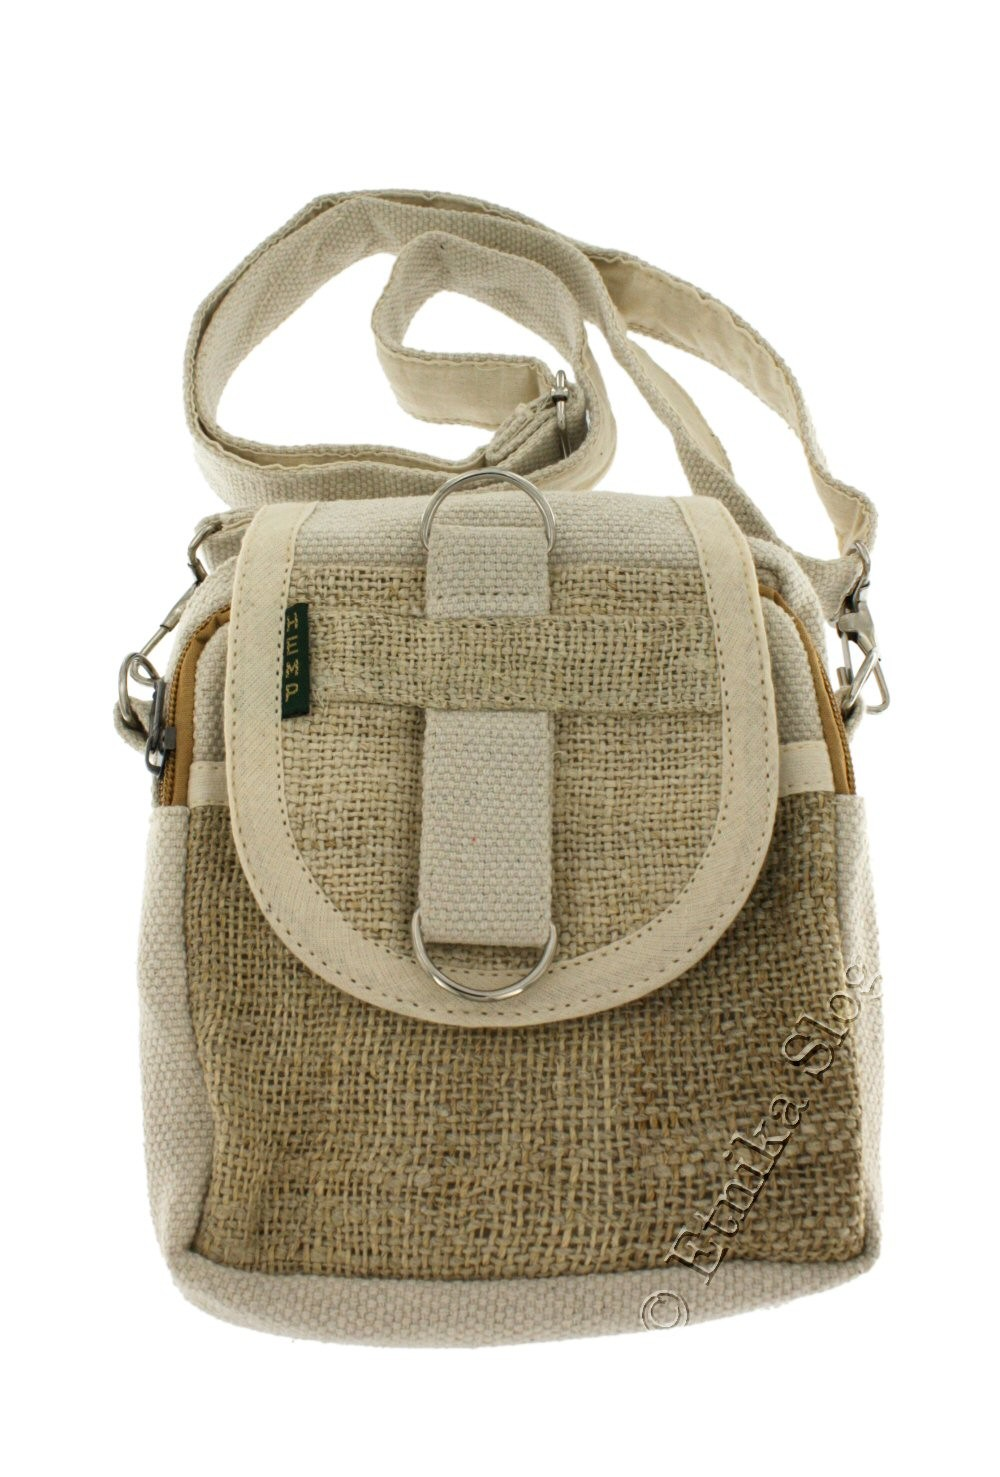 BAGS IN HEMP CNP-BSP12-02 - Oriente Import S.r.l.